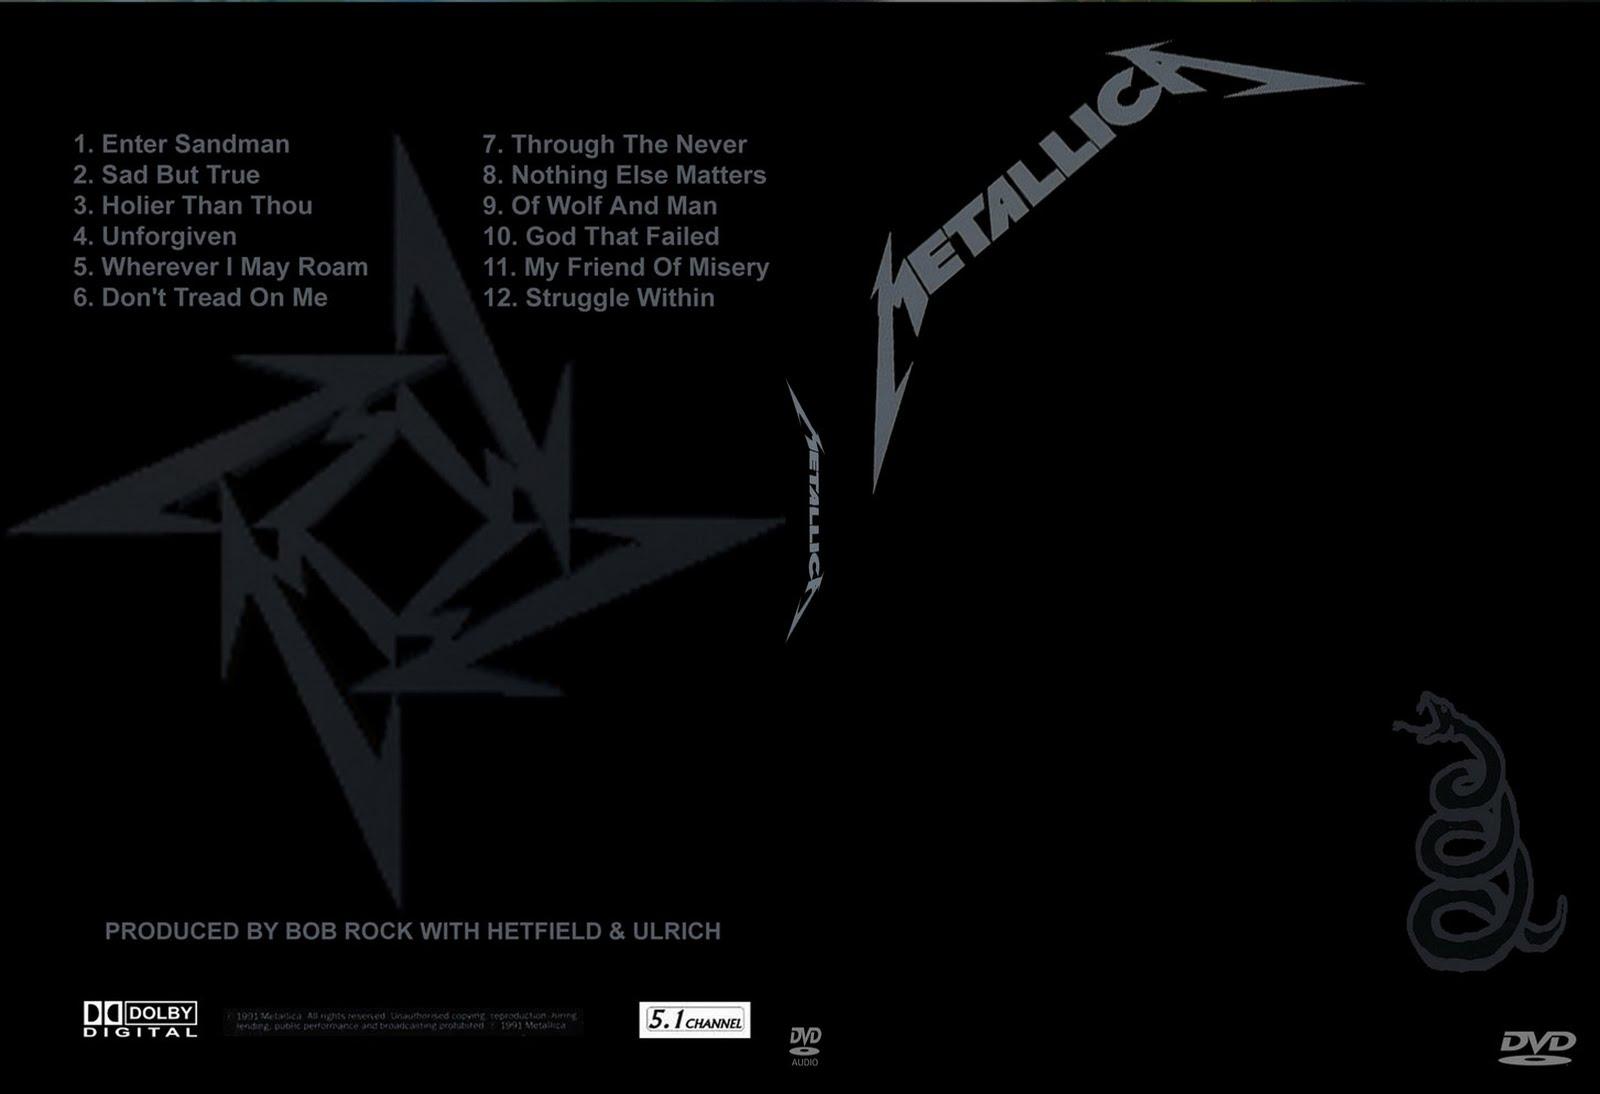 metallica through the never album rar